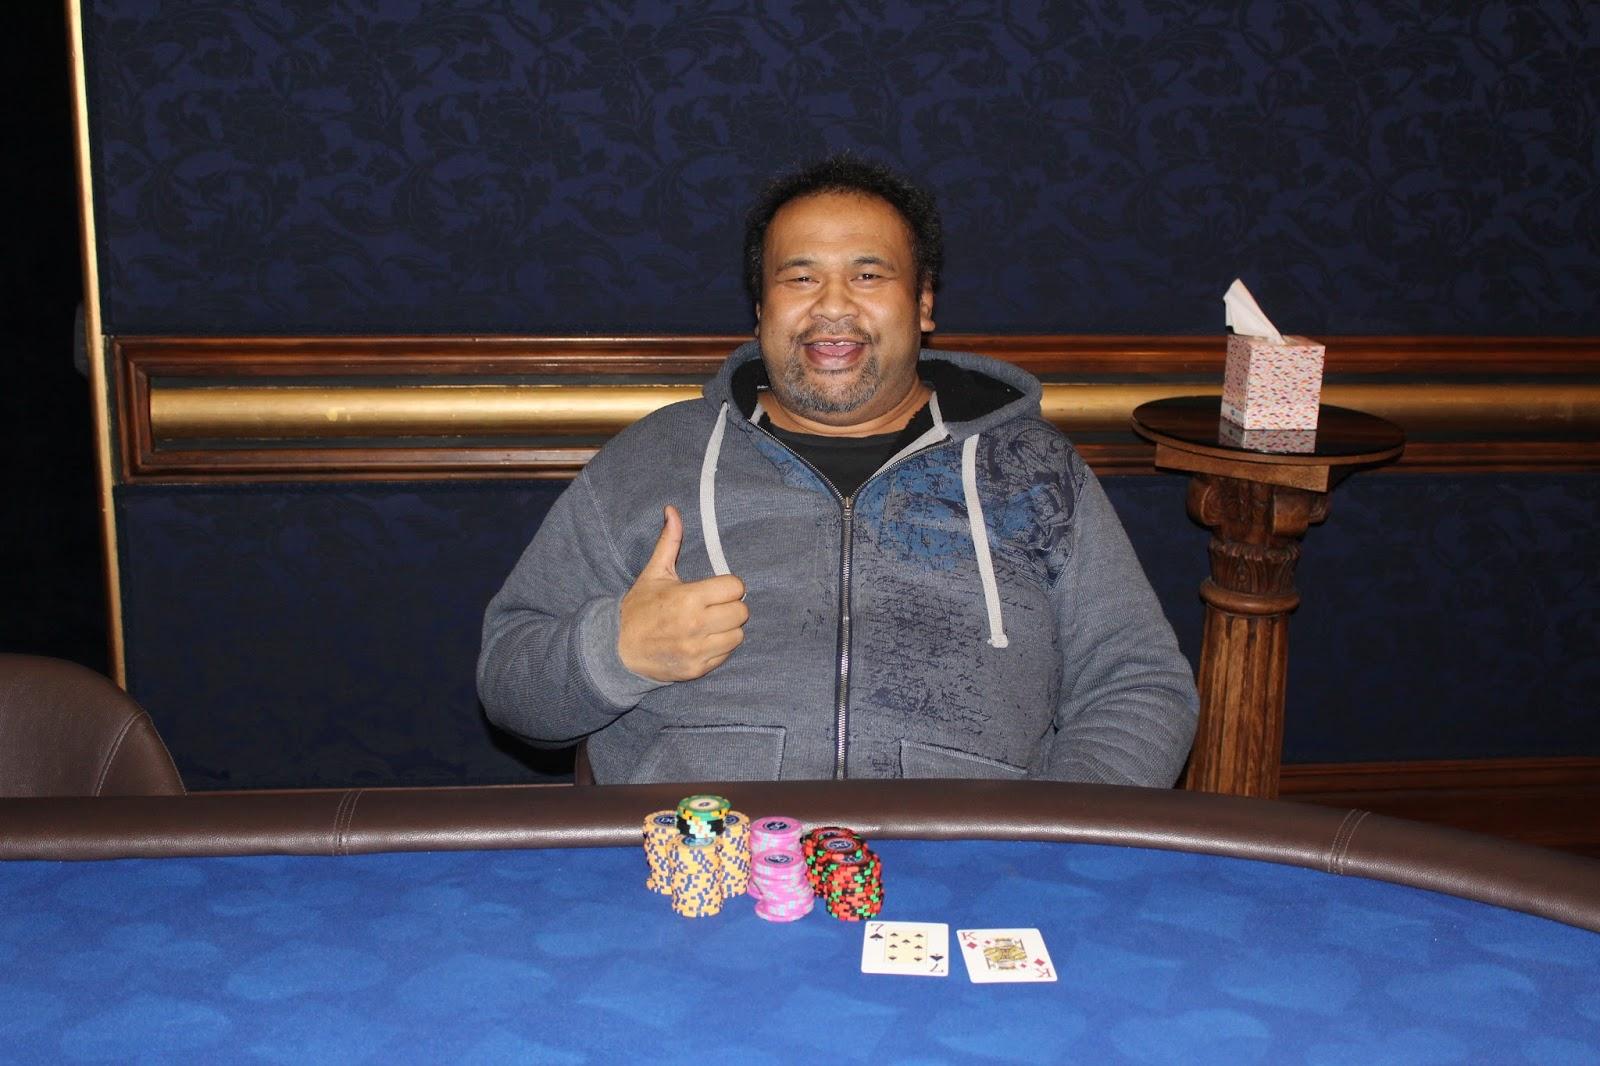 Dunedin Casino Poker Tournament Winner Freezeout Champion